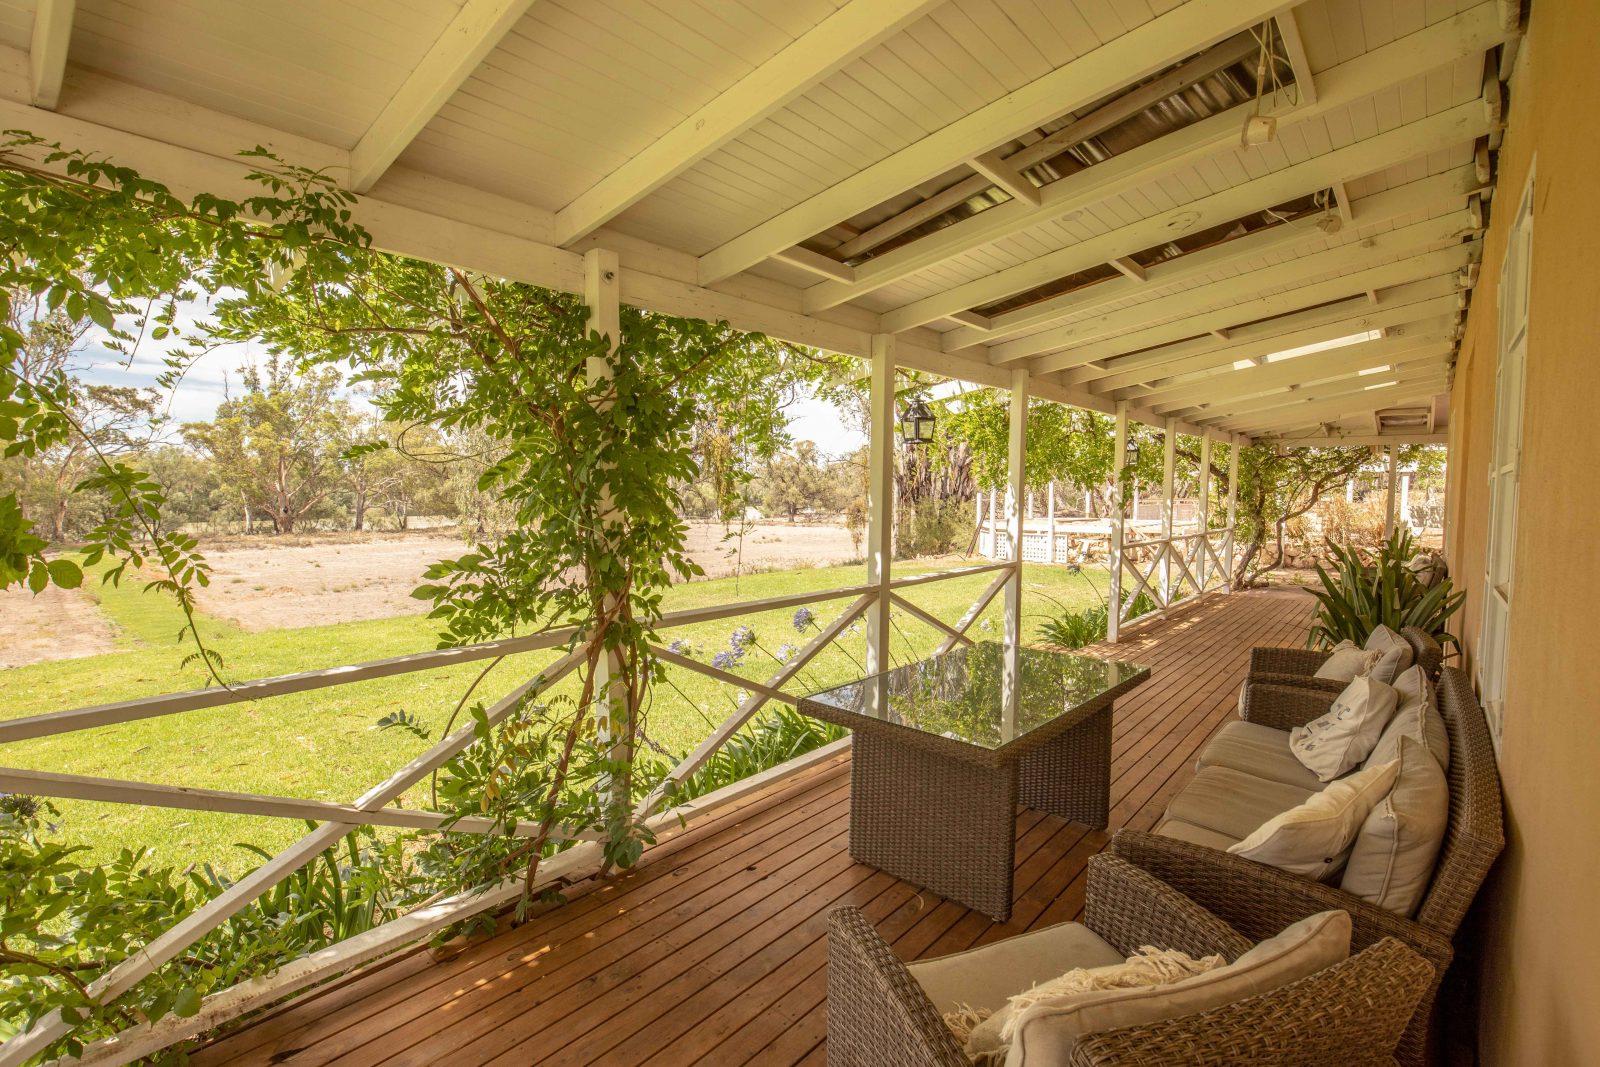 river views from the shaded veranda